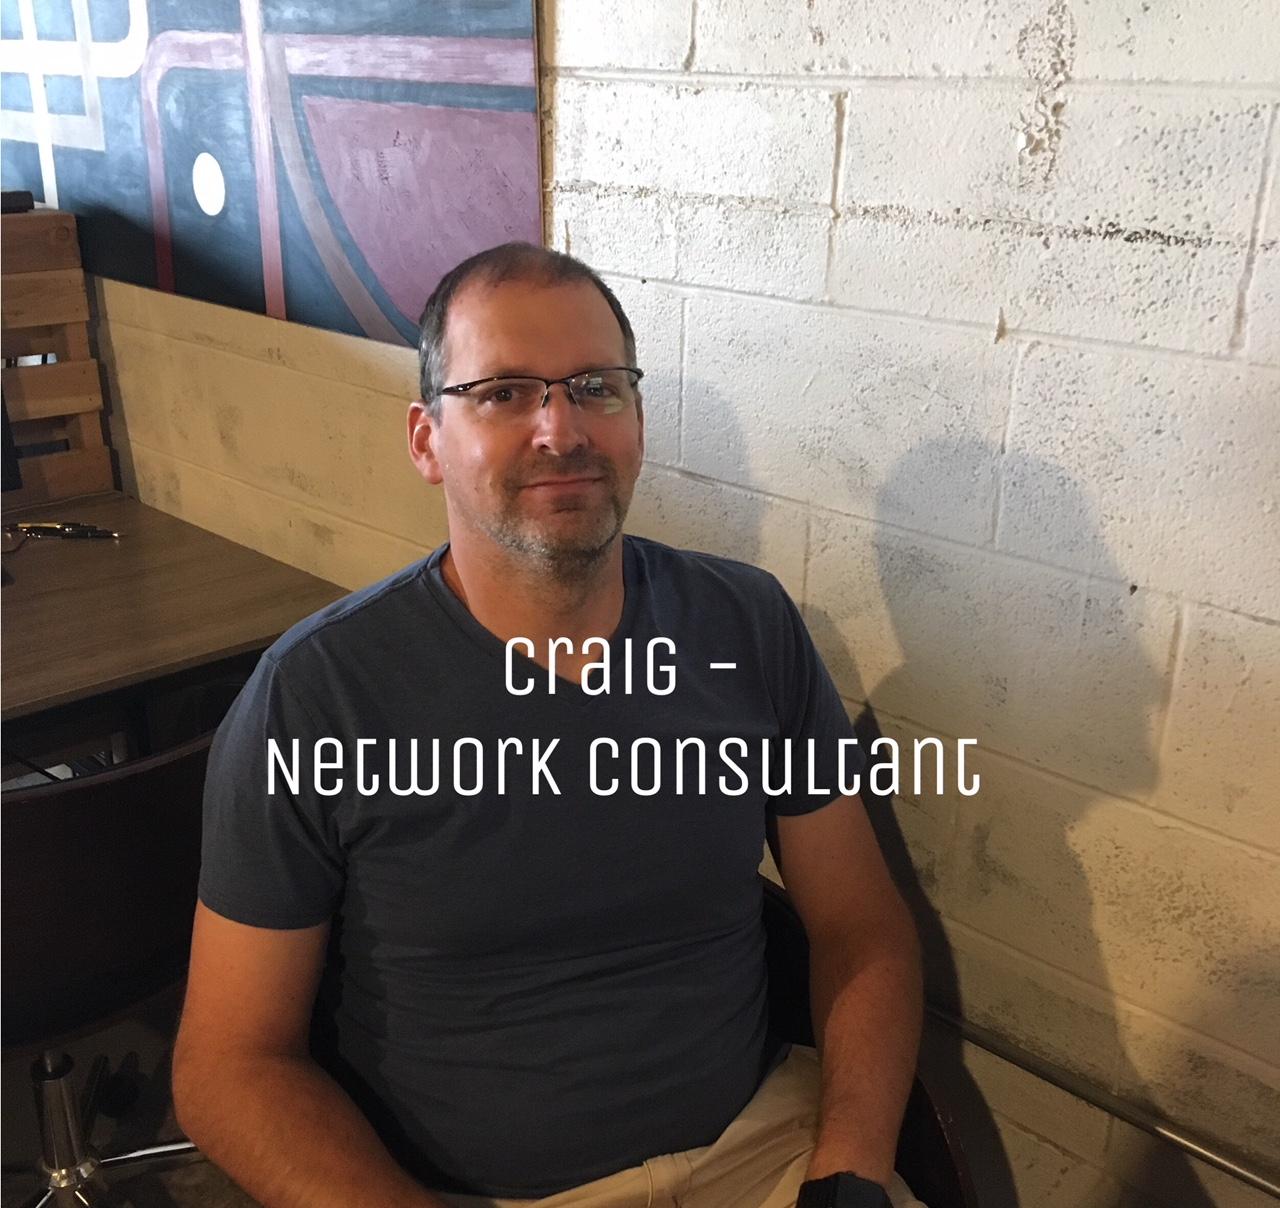 Craig_network consultant.jpeg